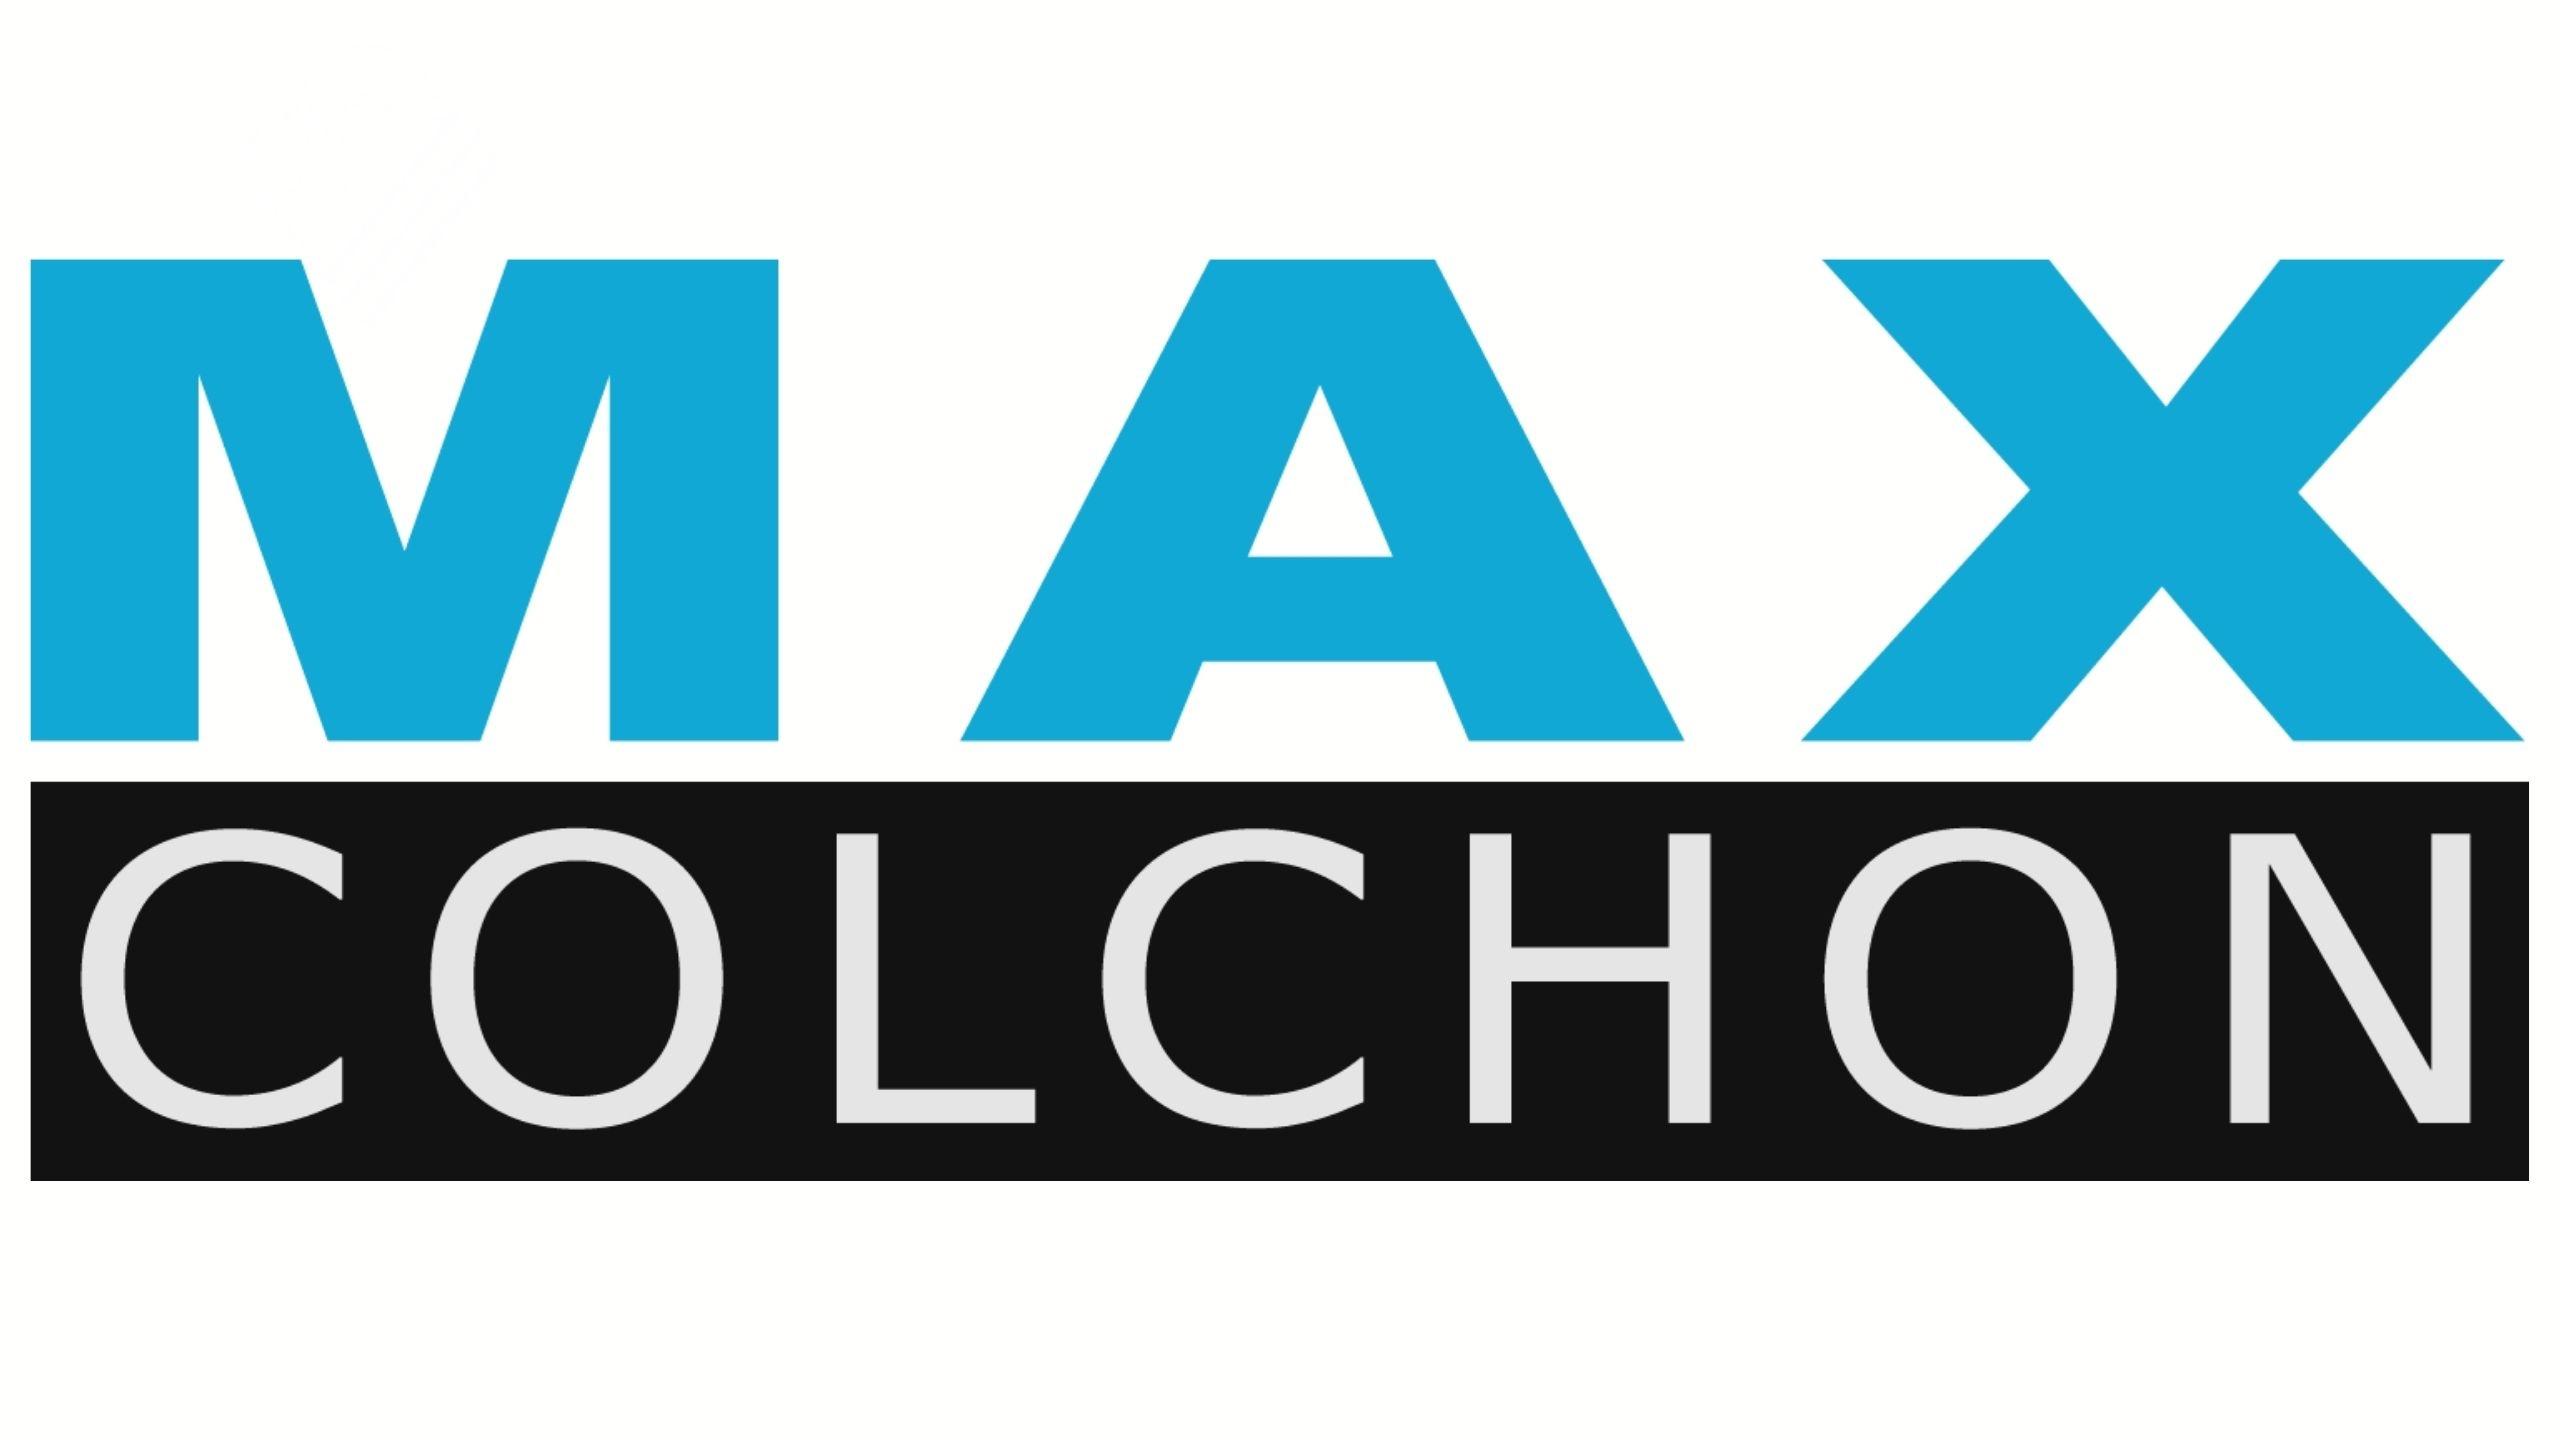 Max Colchón, primer fichaje.